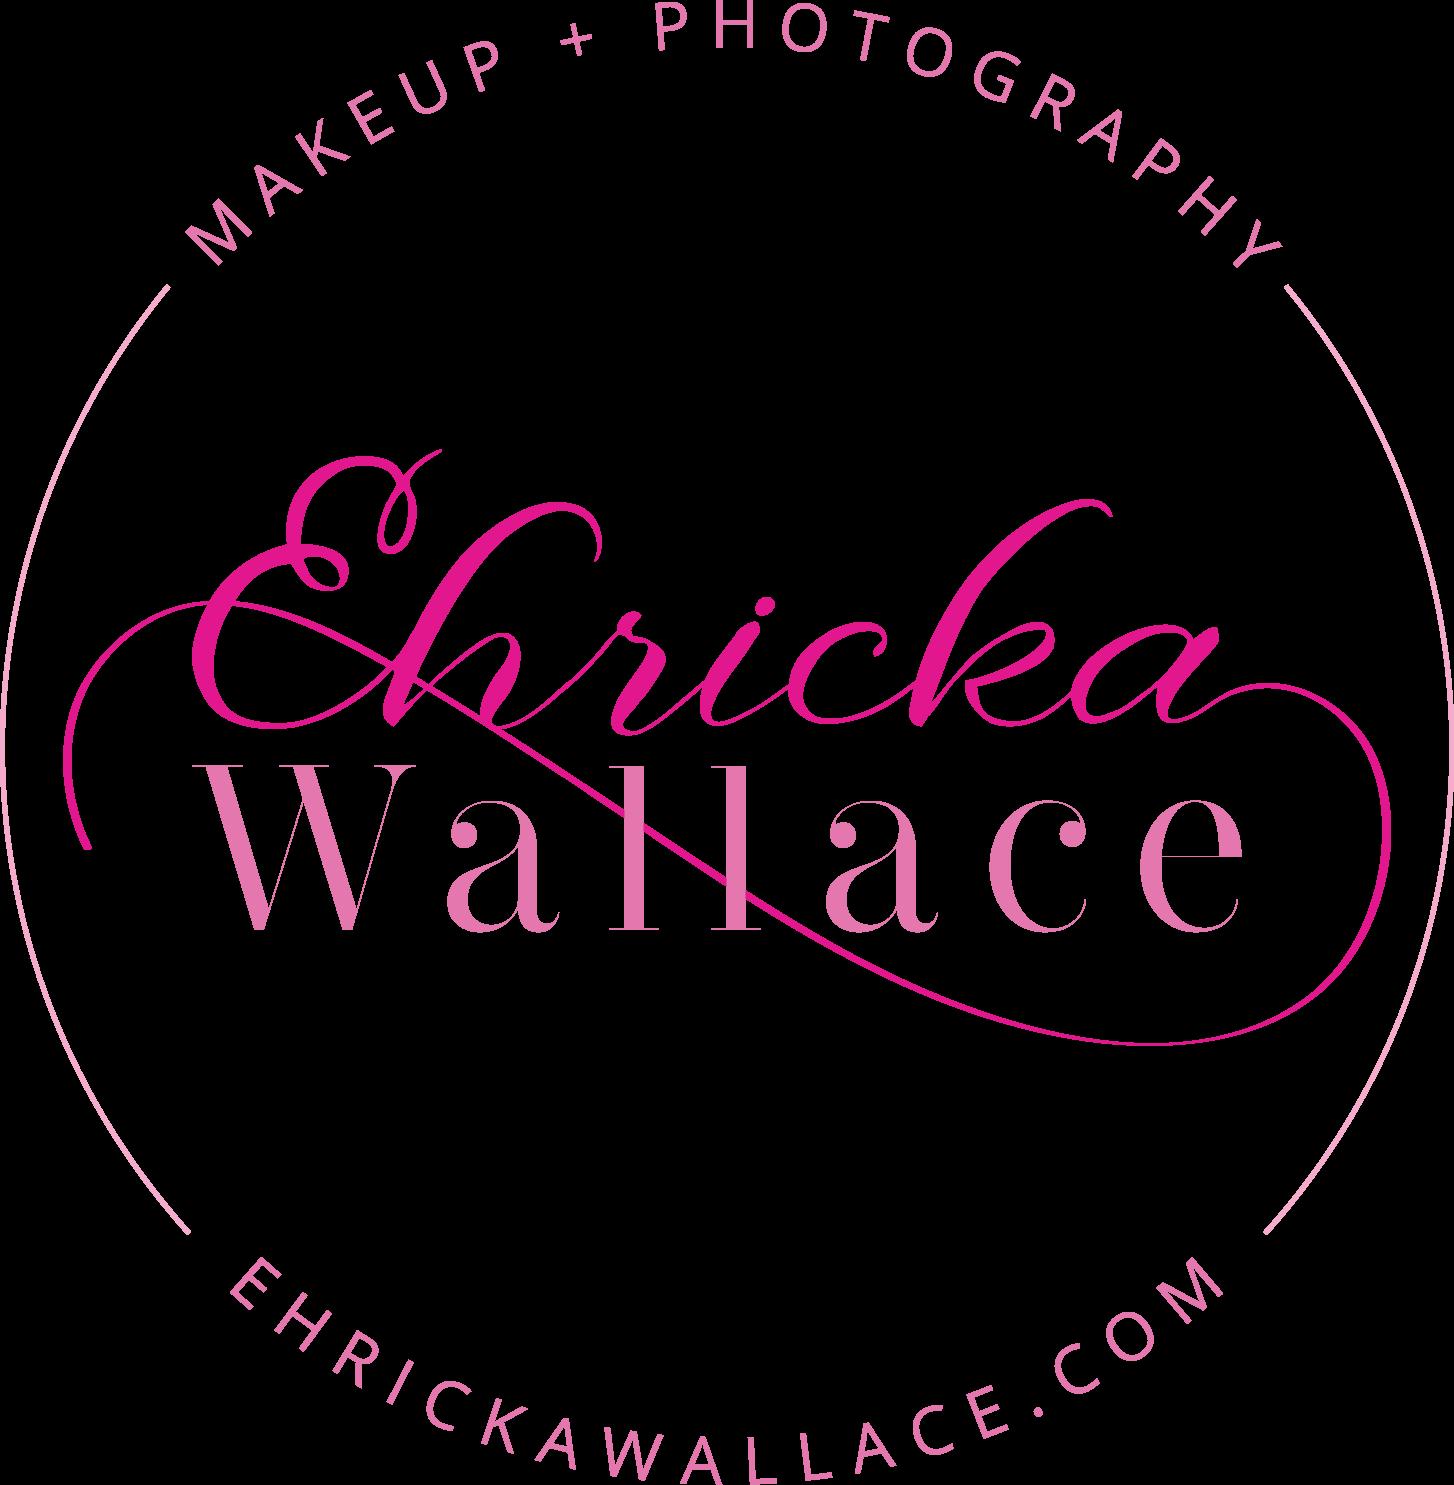 Ehricka Wallace